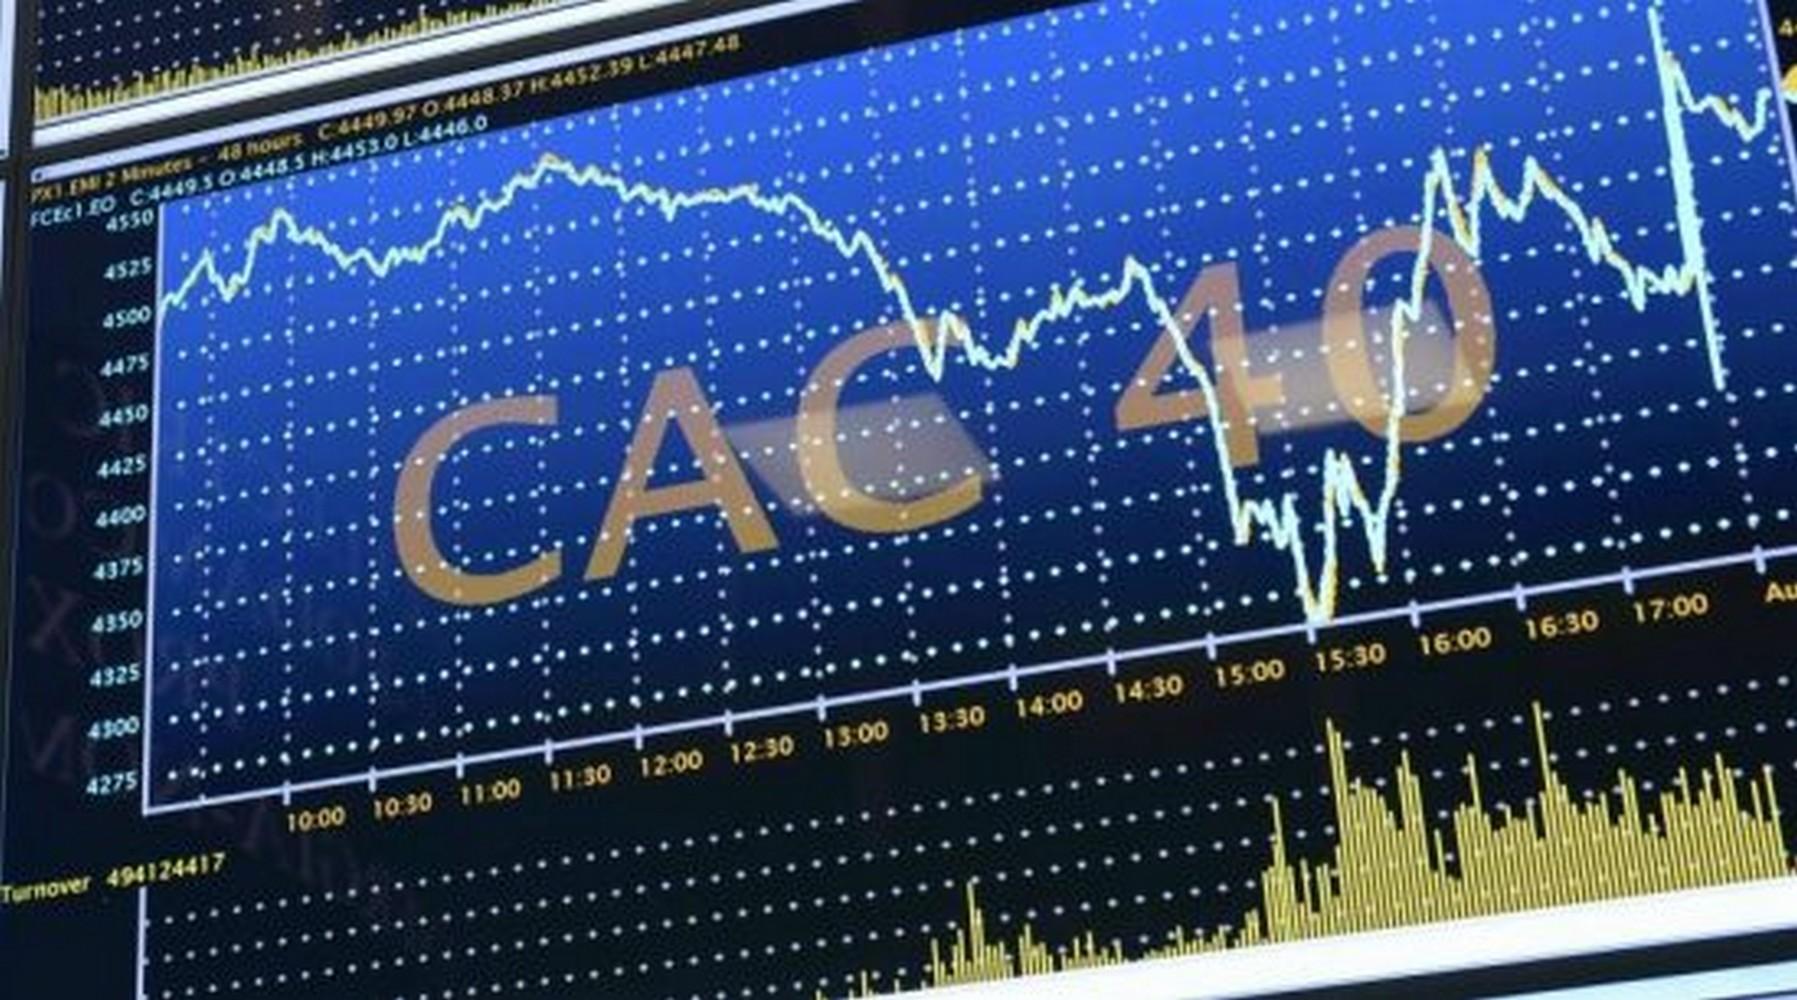 Gagner sur le CAC40 : comment investir et gagner en bourse ?